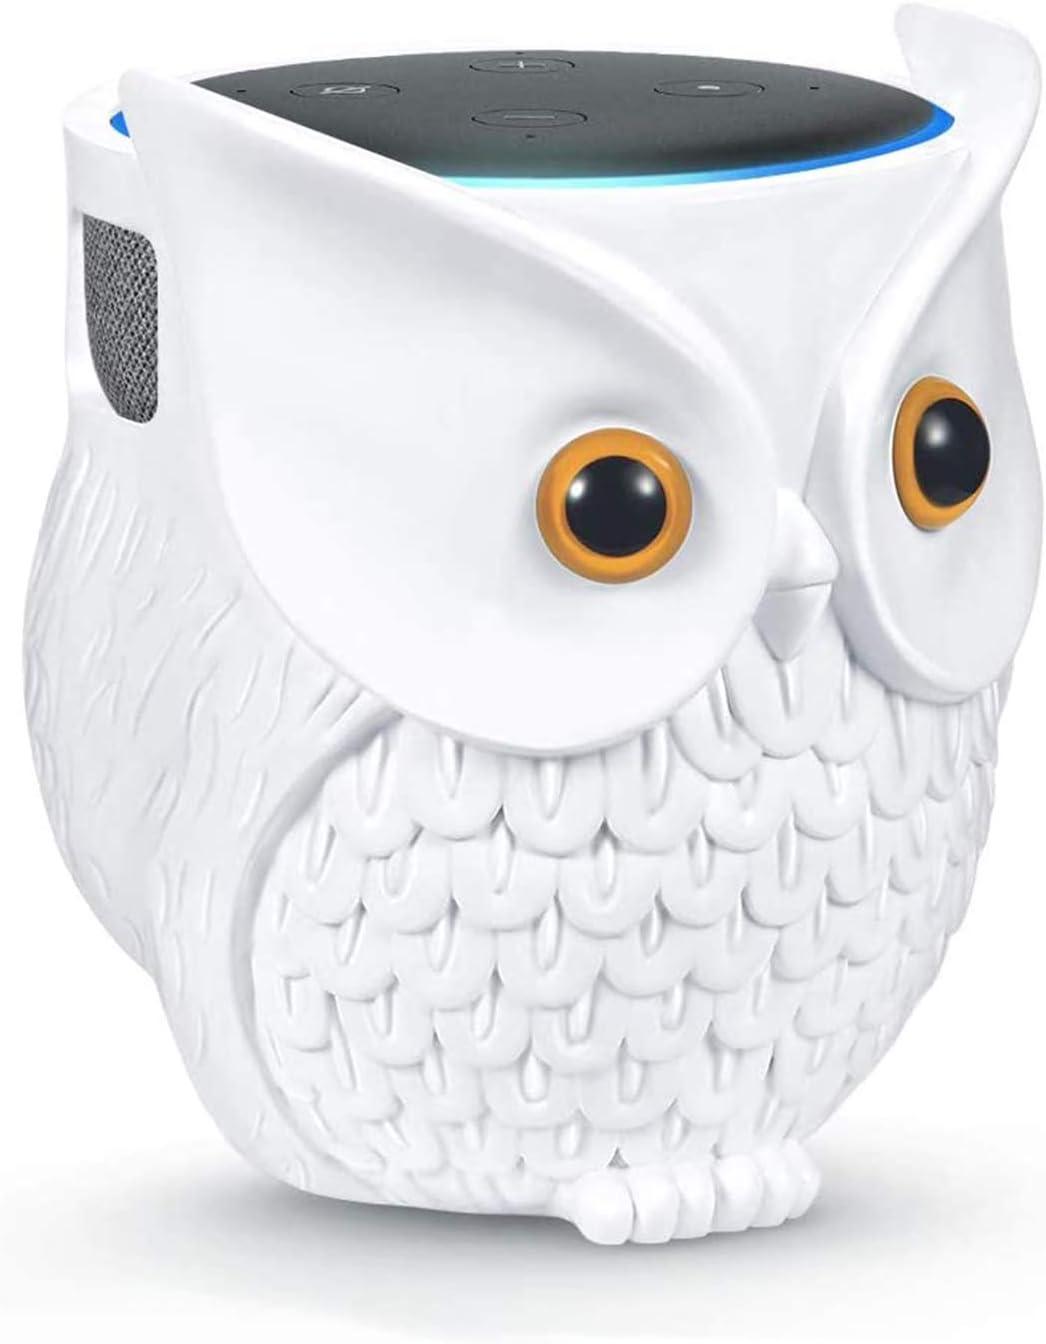 LDYAN Owl Holder Stand, Owl Statue Smart Speaker Holder Stand for Echo Dot 4th/3rd/2nd and 1st Generation, Google Home Mini/Google Nest Mini (2nd Gen),Cartoon Decor Owl Shape Home Decor - White